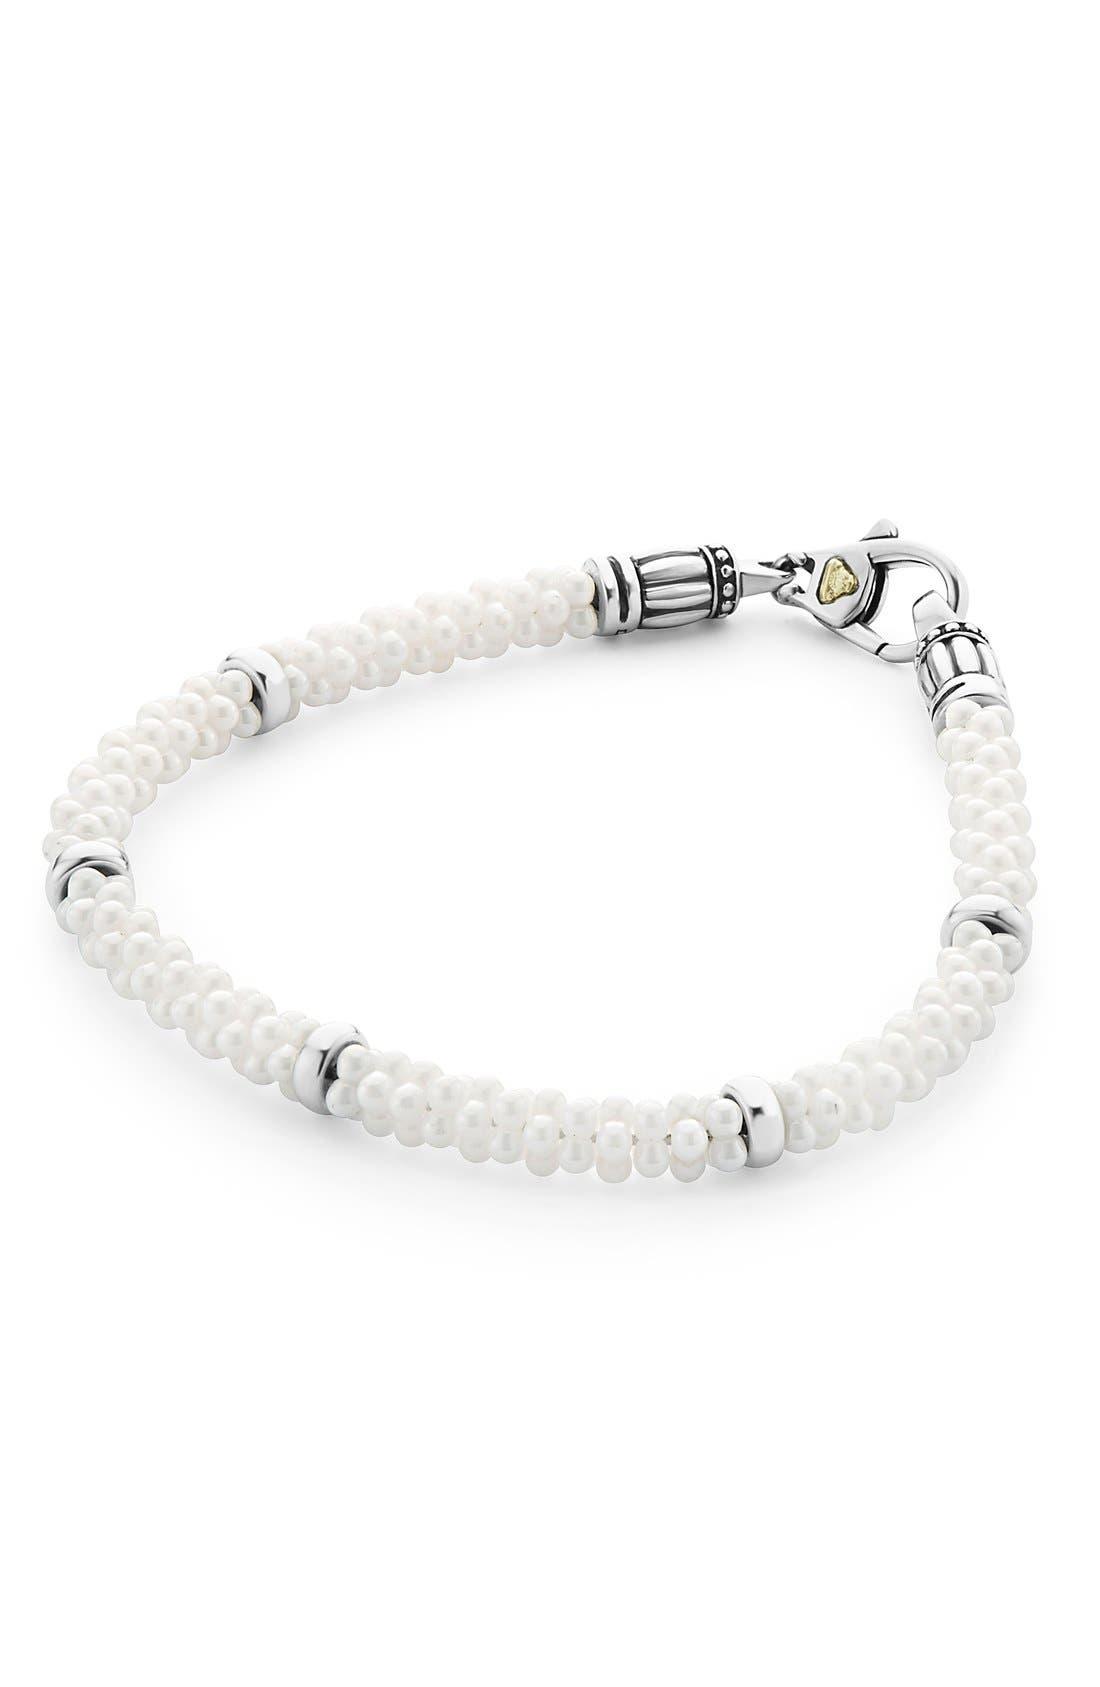 Alternate Image 1 Selected - LAGOS 'Black & White Caviar' Bracelet